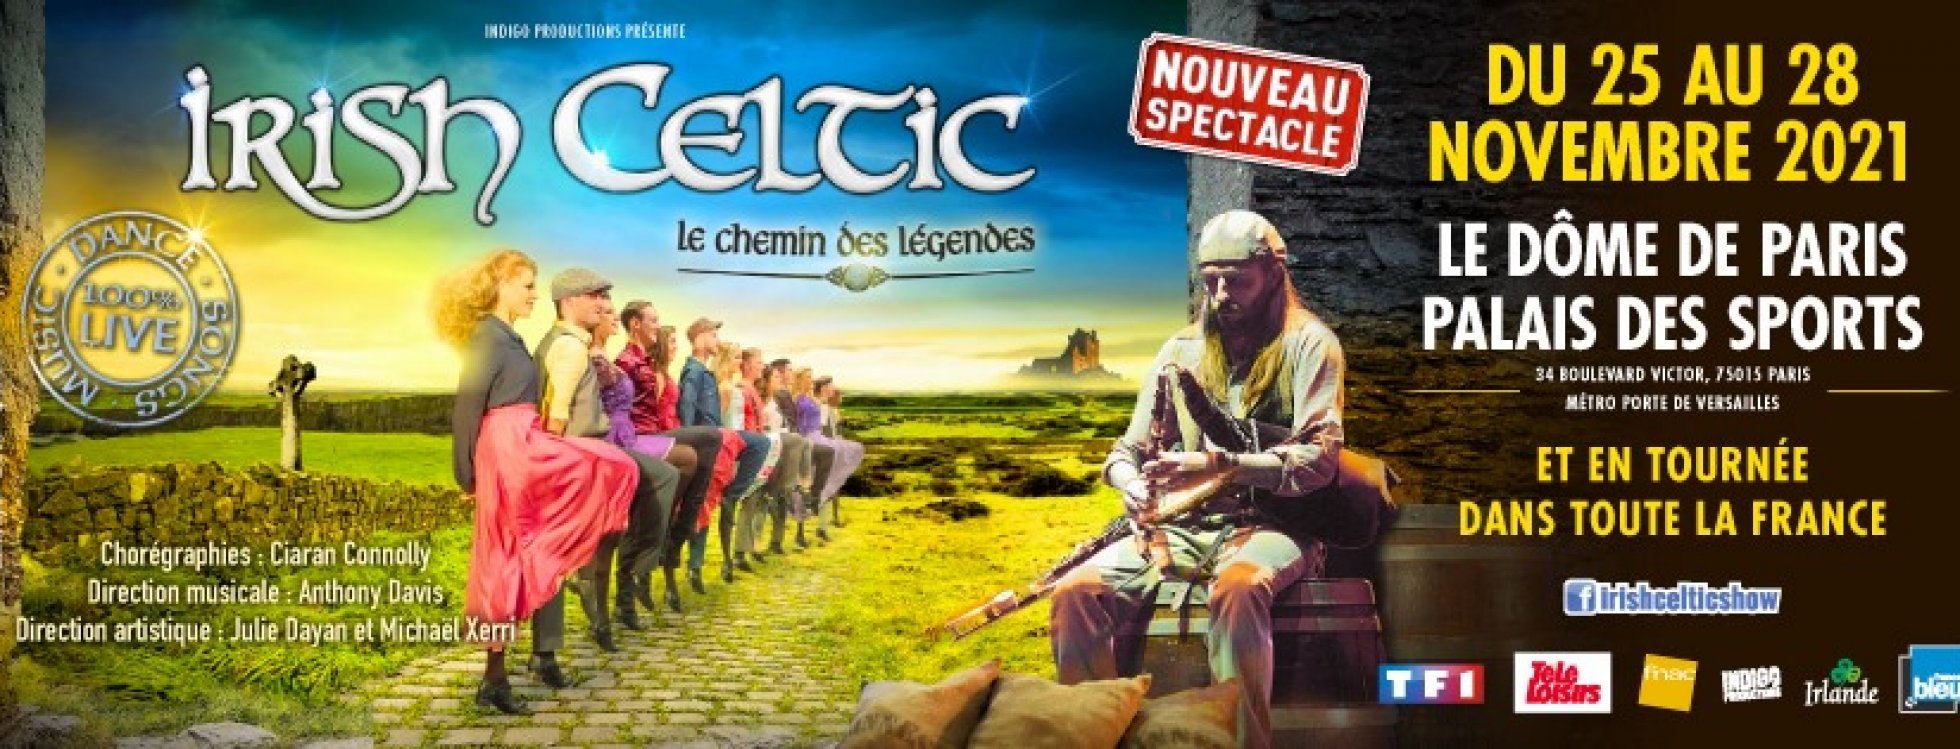 dome de paris : IRISH CELTIC